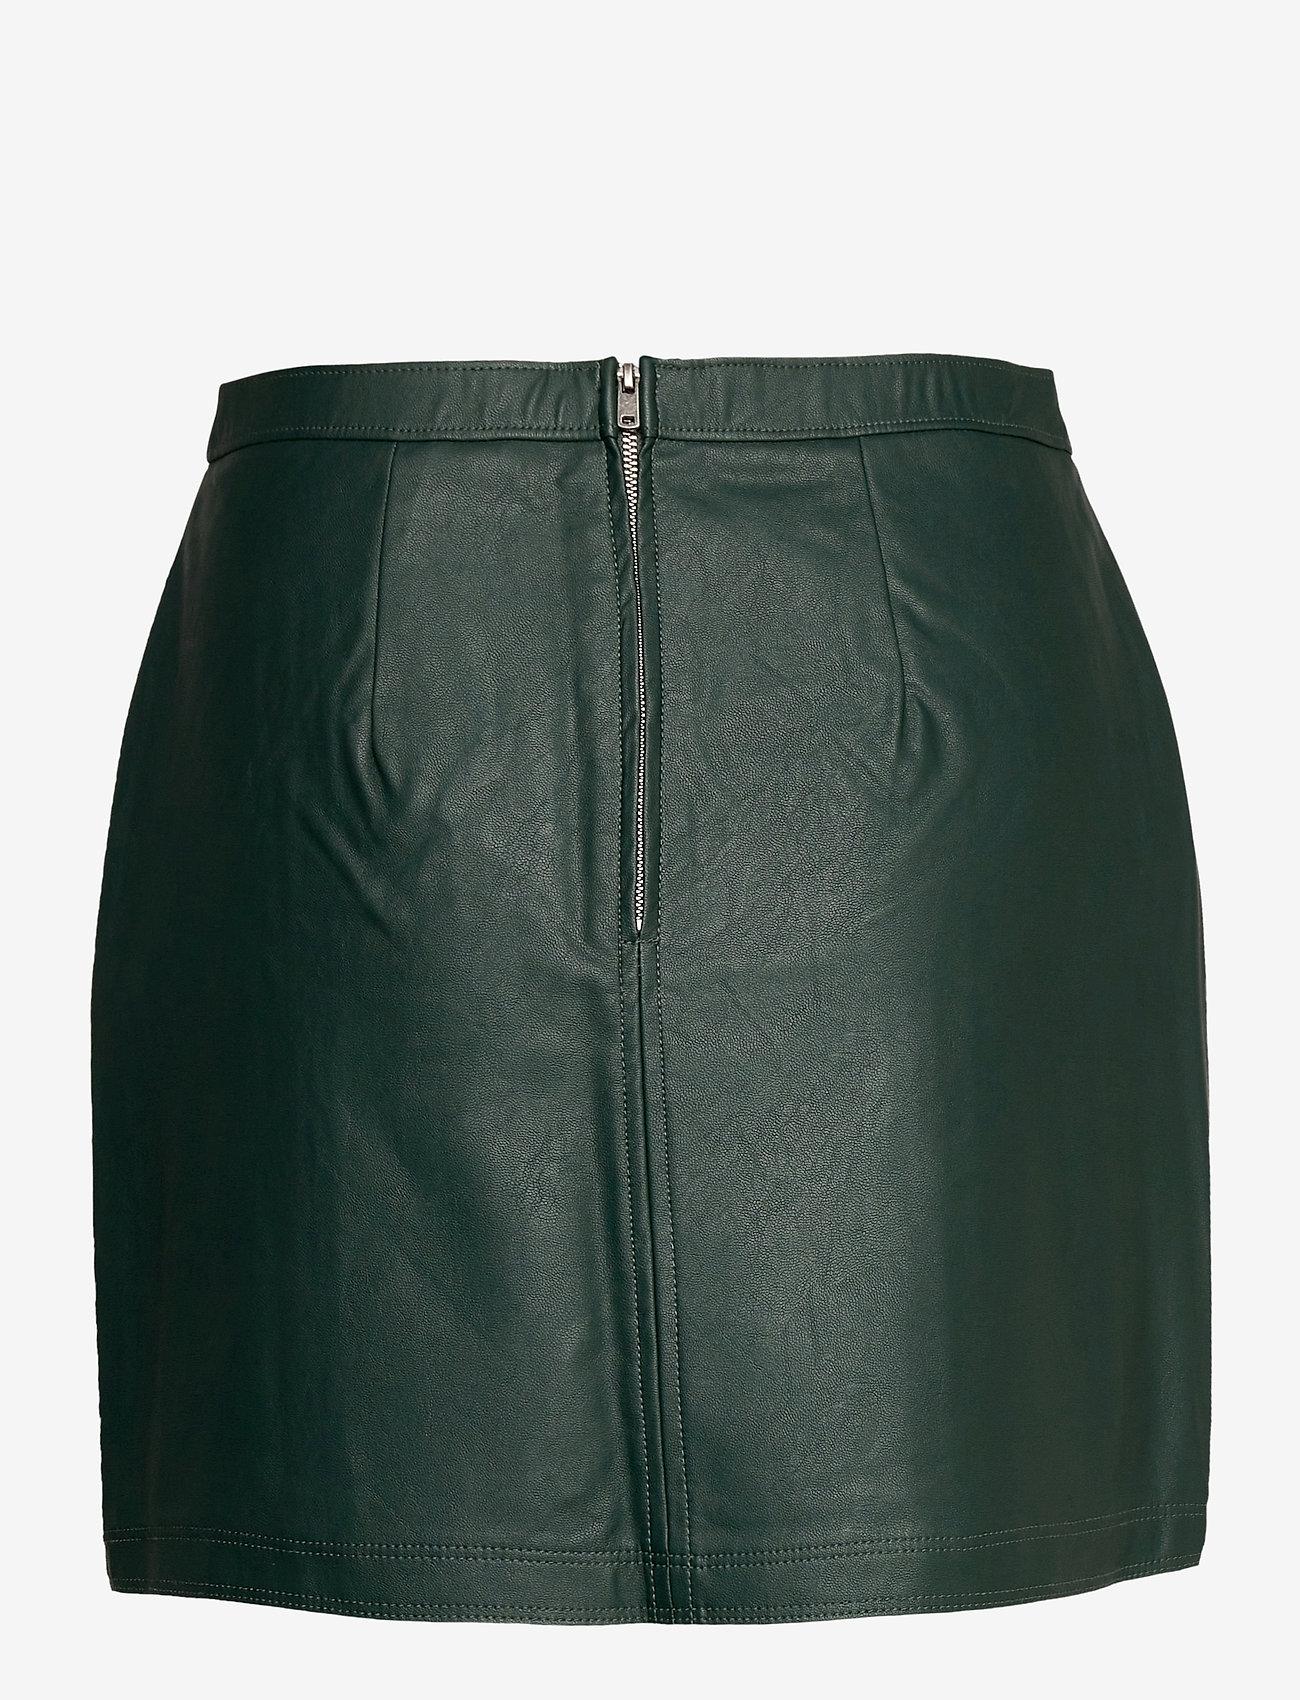 Abercrombie & Fitch - ANF WOMENS SKIRTS - korta kjolar - olive dd - 1